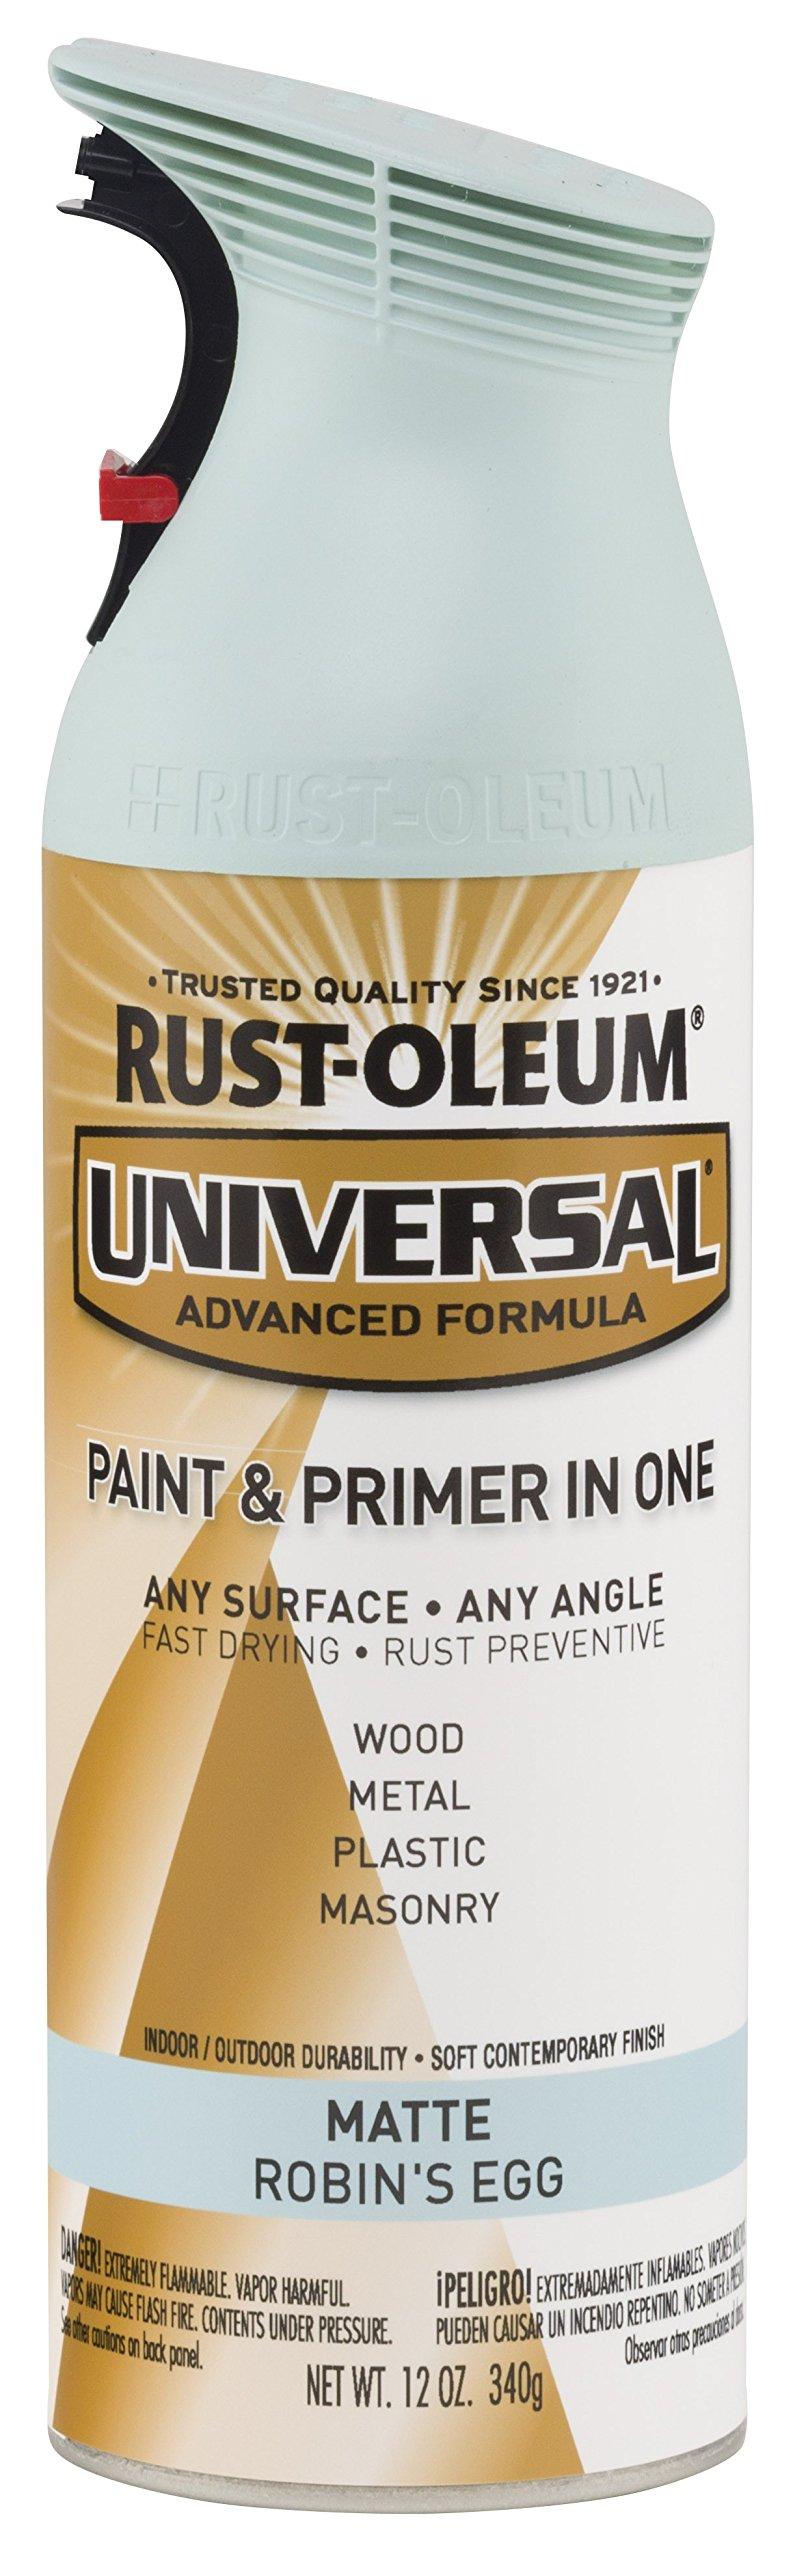 Rust-Oleum 282812 Universal All Surface Spray Paint, 12 oz, Matte Robin's Egg